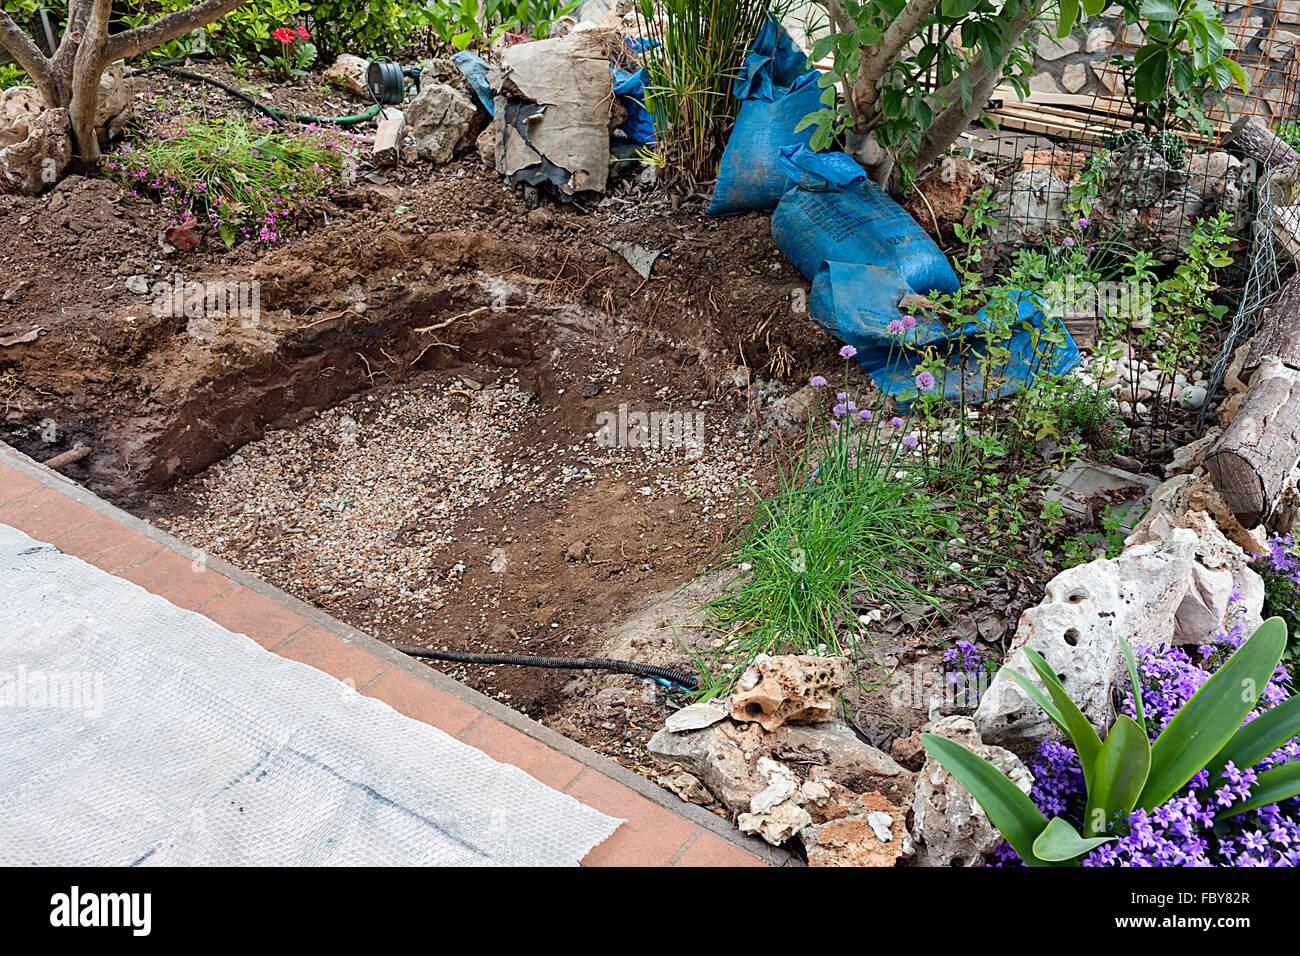 digging hole garden stockfotos digging hole garden bilder alamy. Black Bedroom Furniture Sets. Home Design Ideas